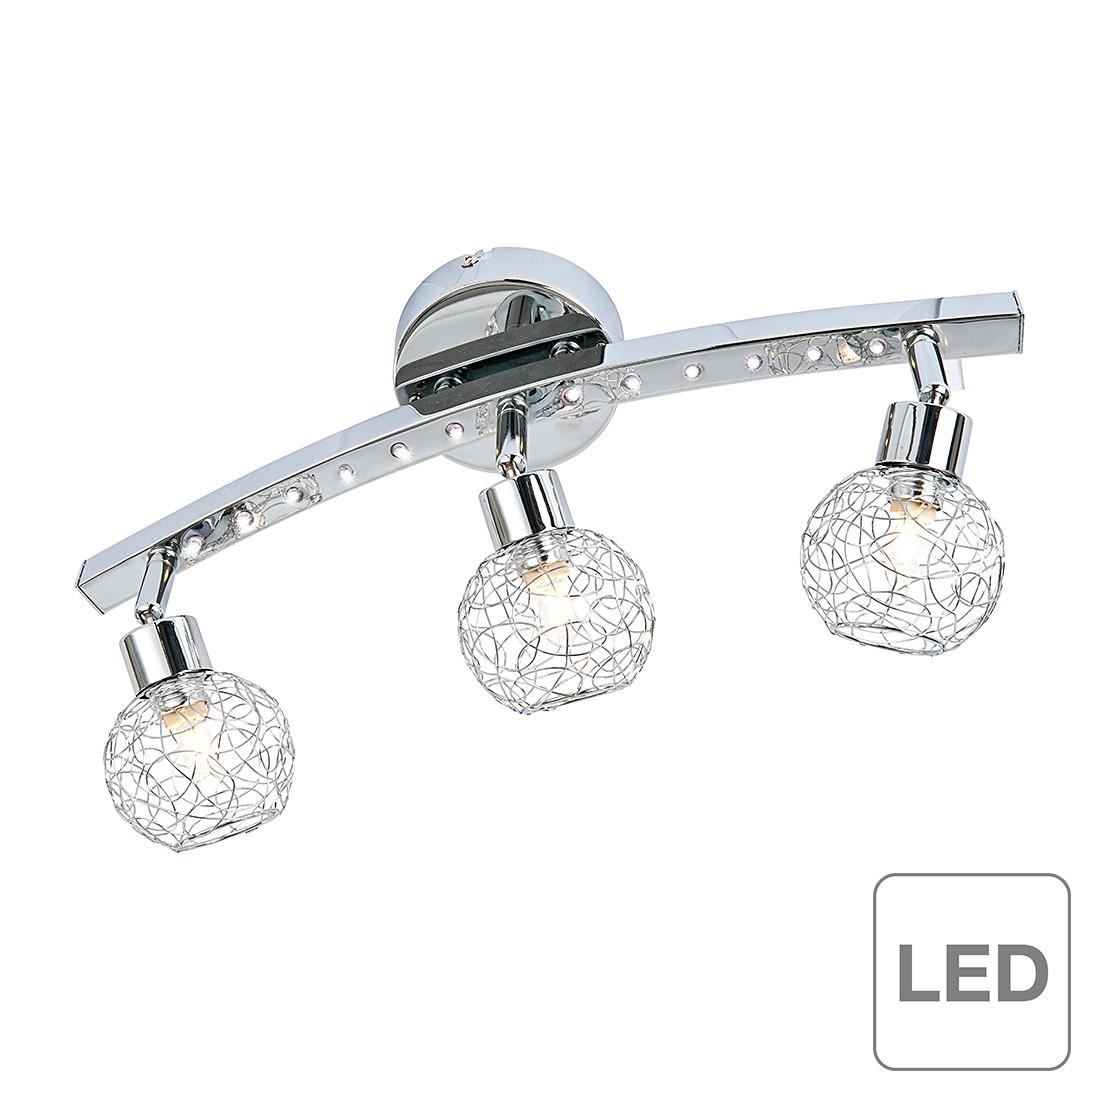 LED-Balken Leo - 15-flammig, Nino Leuchten